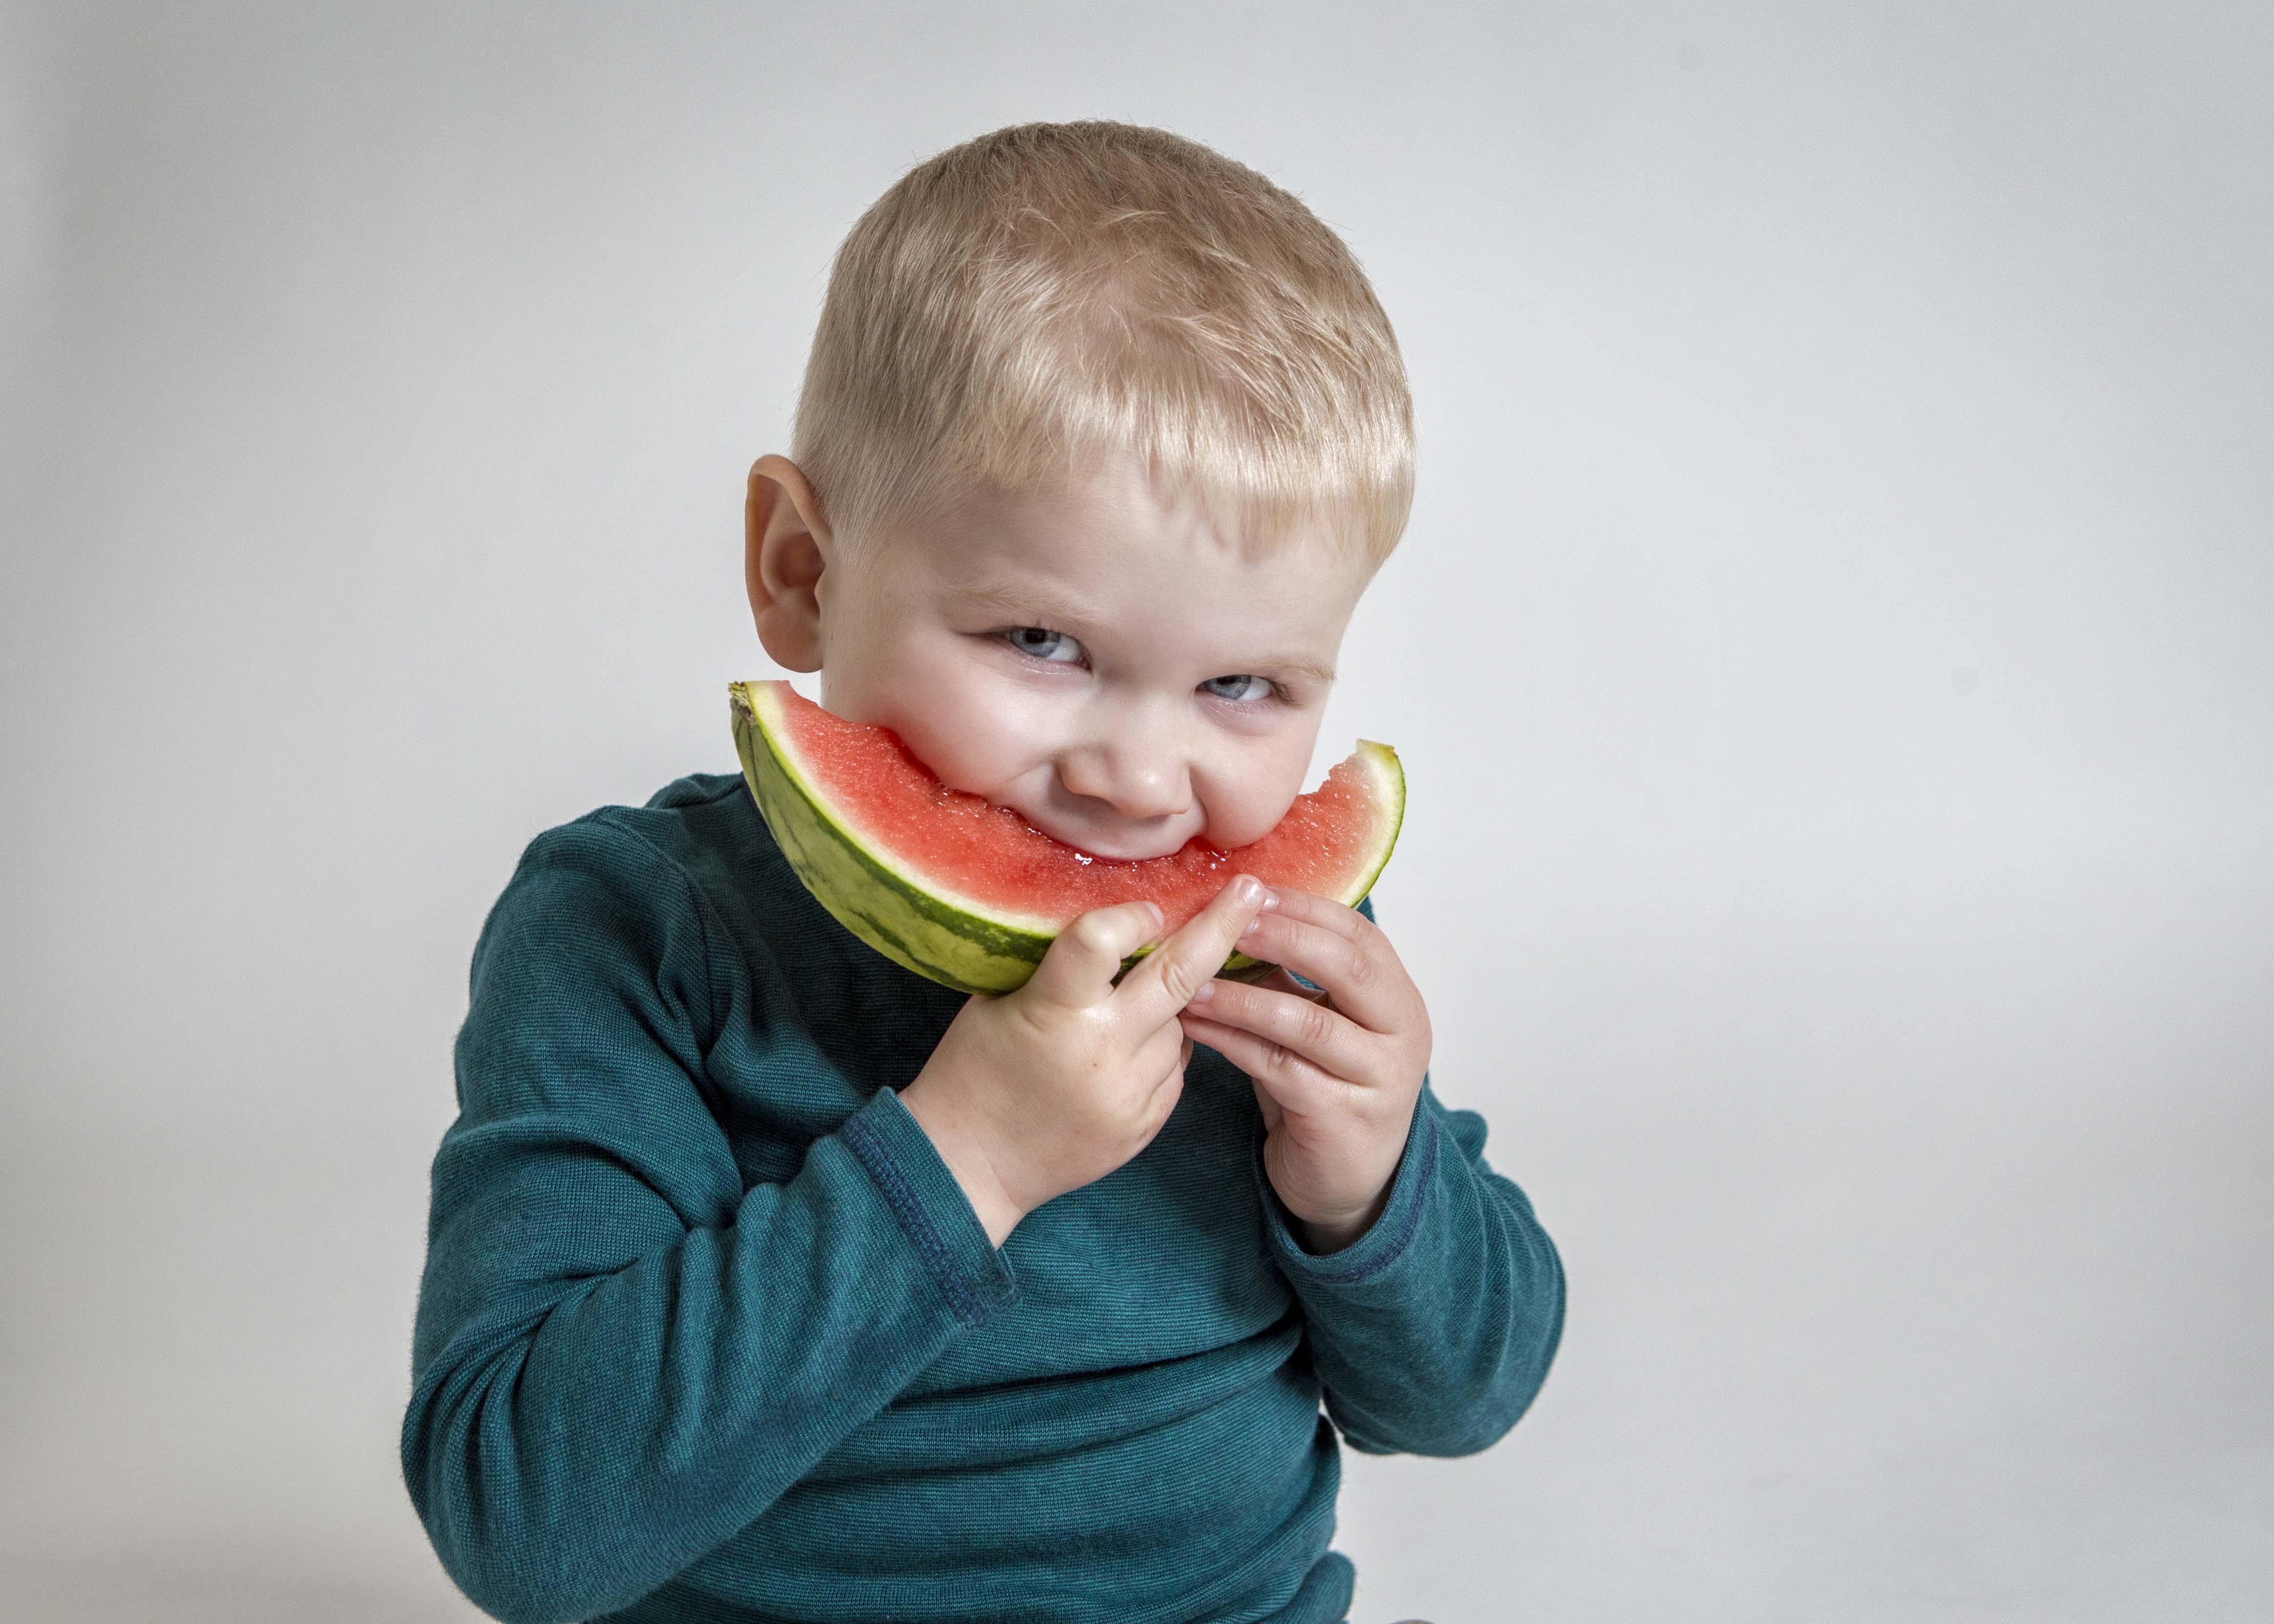 child-eating-melon-photography-kronborgphotography